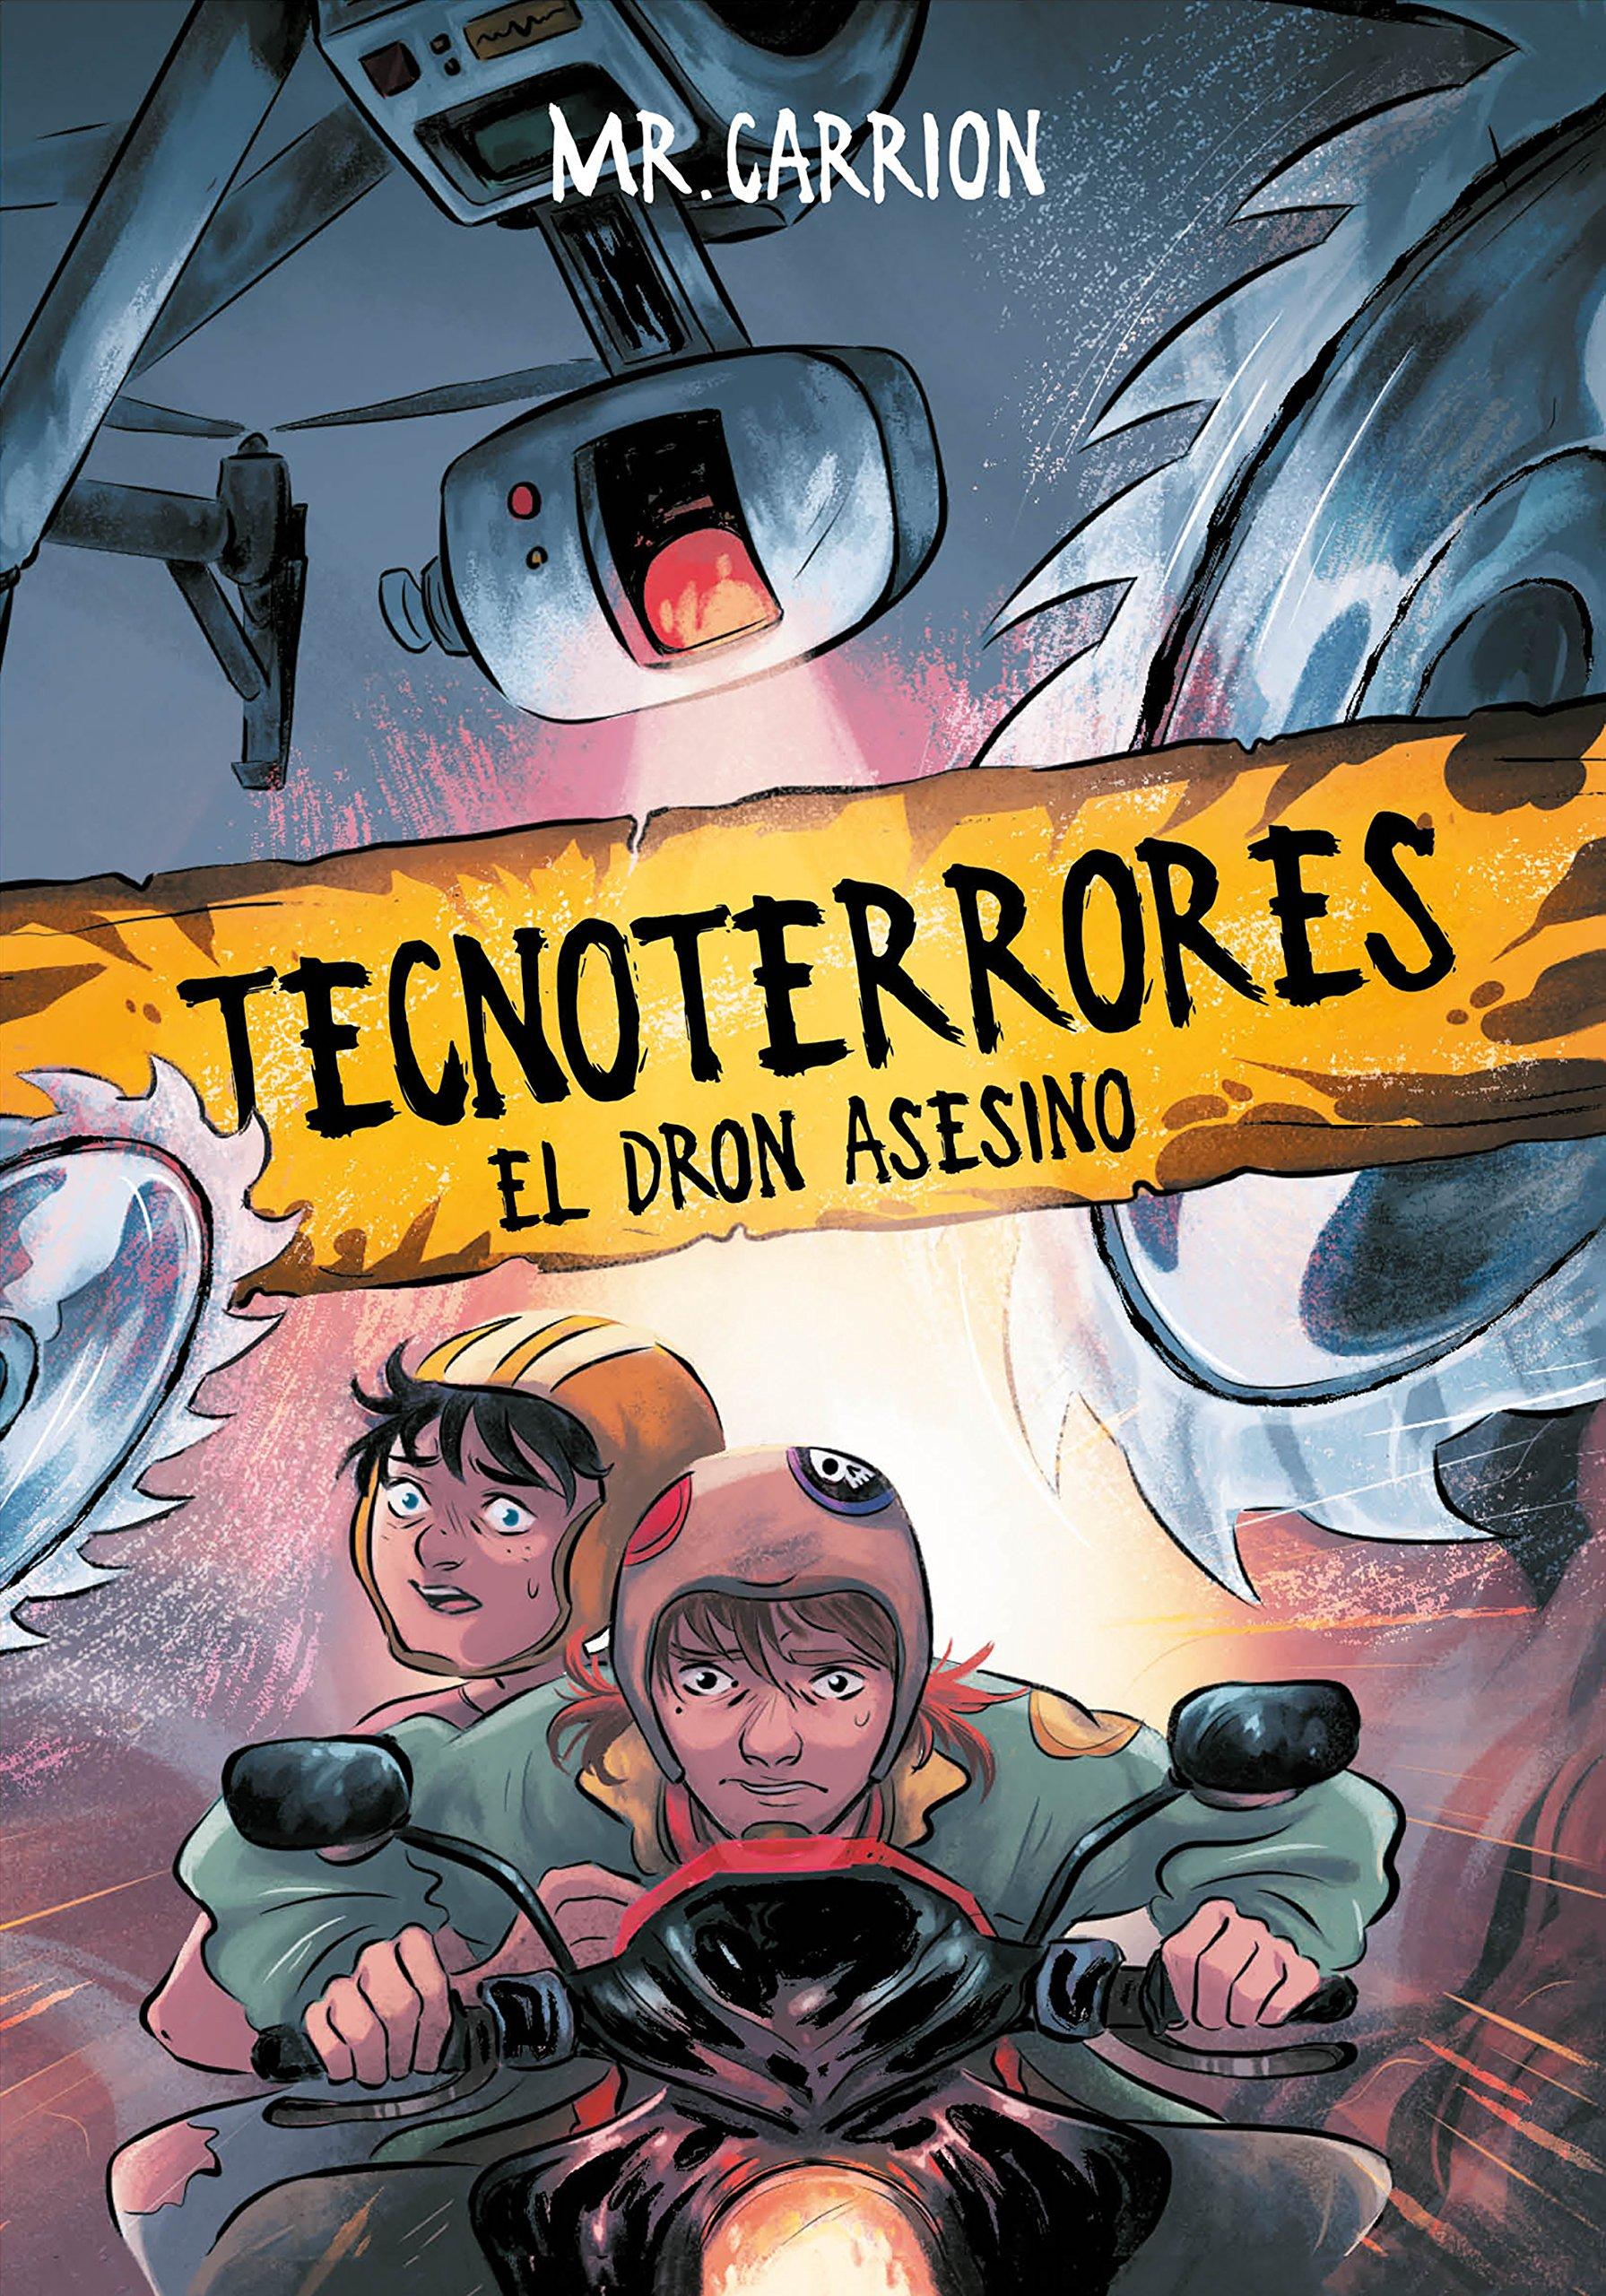 El dron asesino (Tecnoterrores 1): Amazon.es: Mr. Carrion: Libros